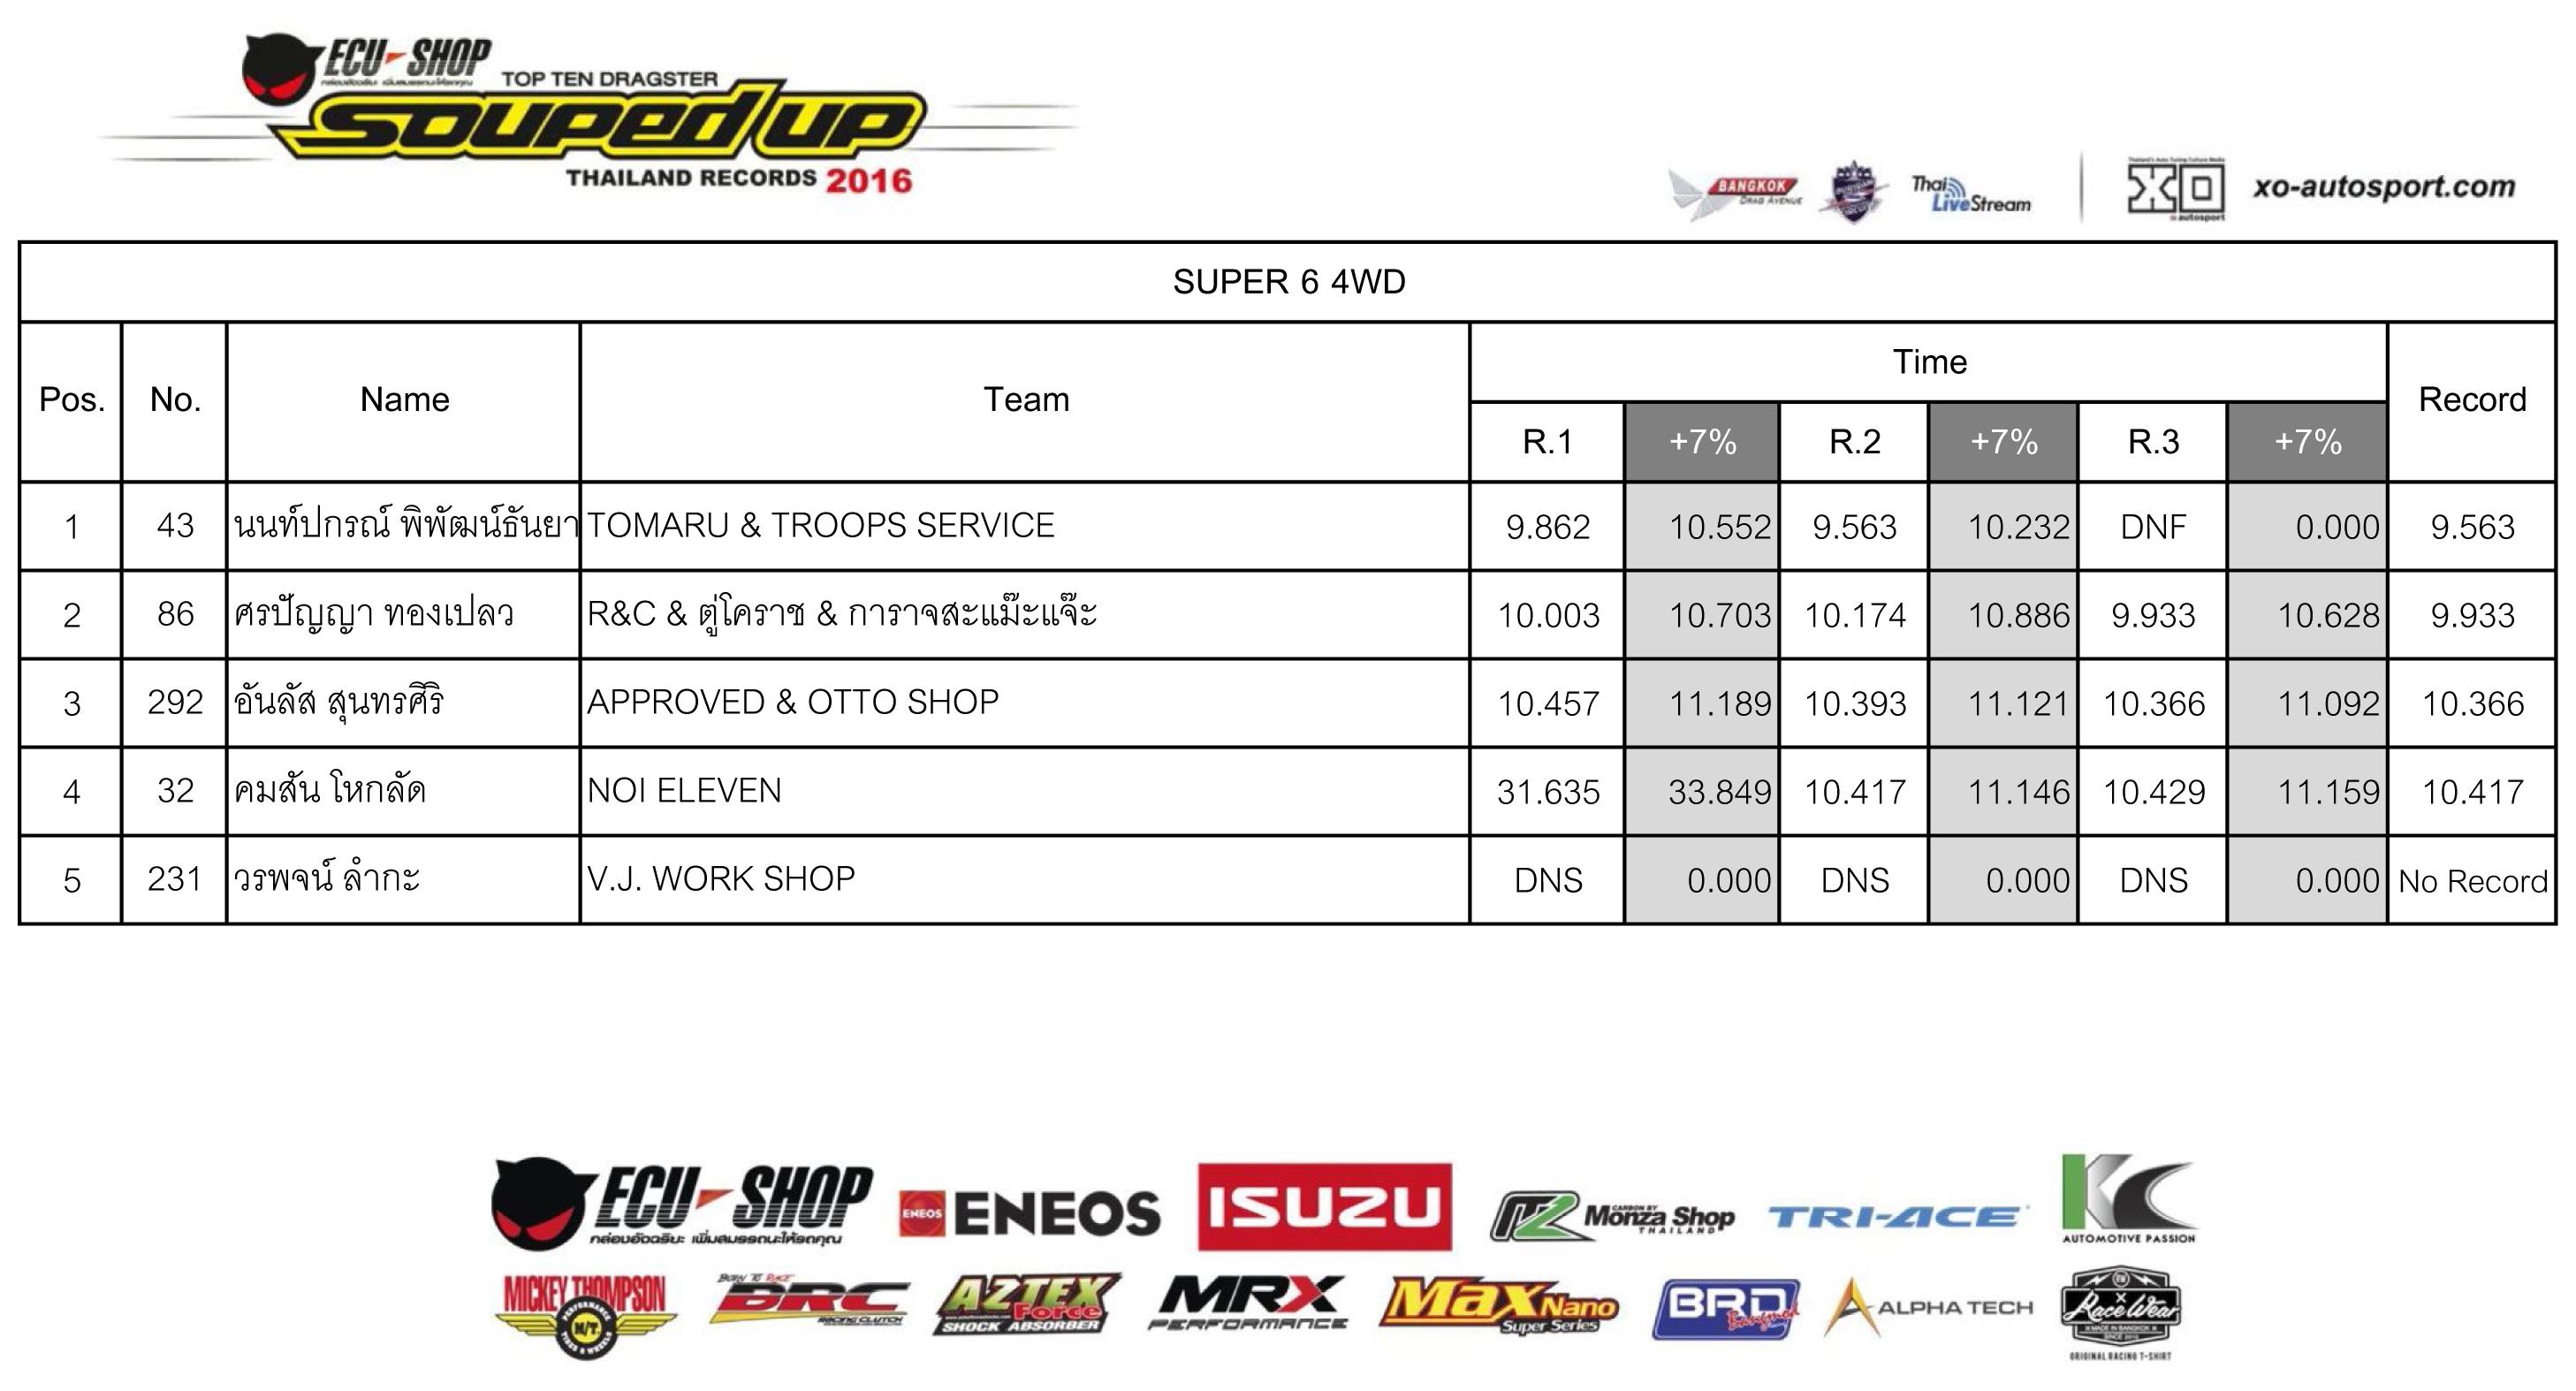 Final-2016-super6-4wd